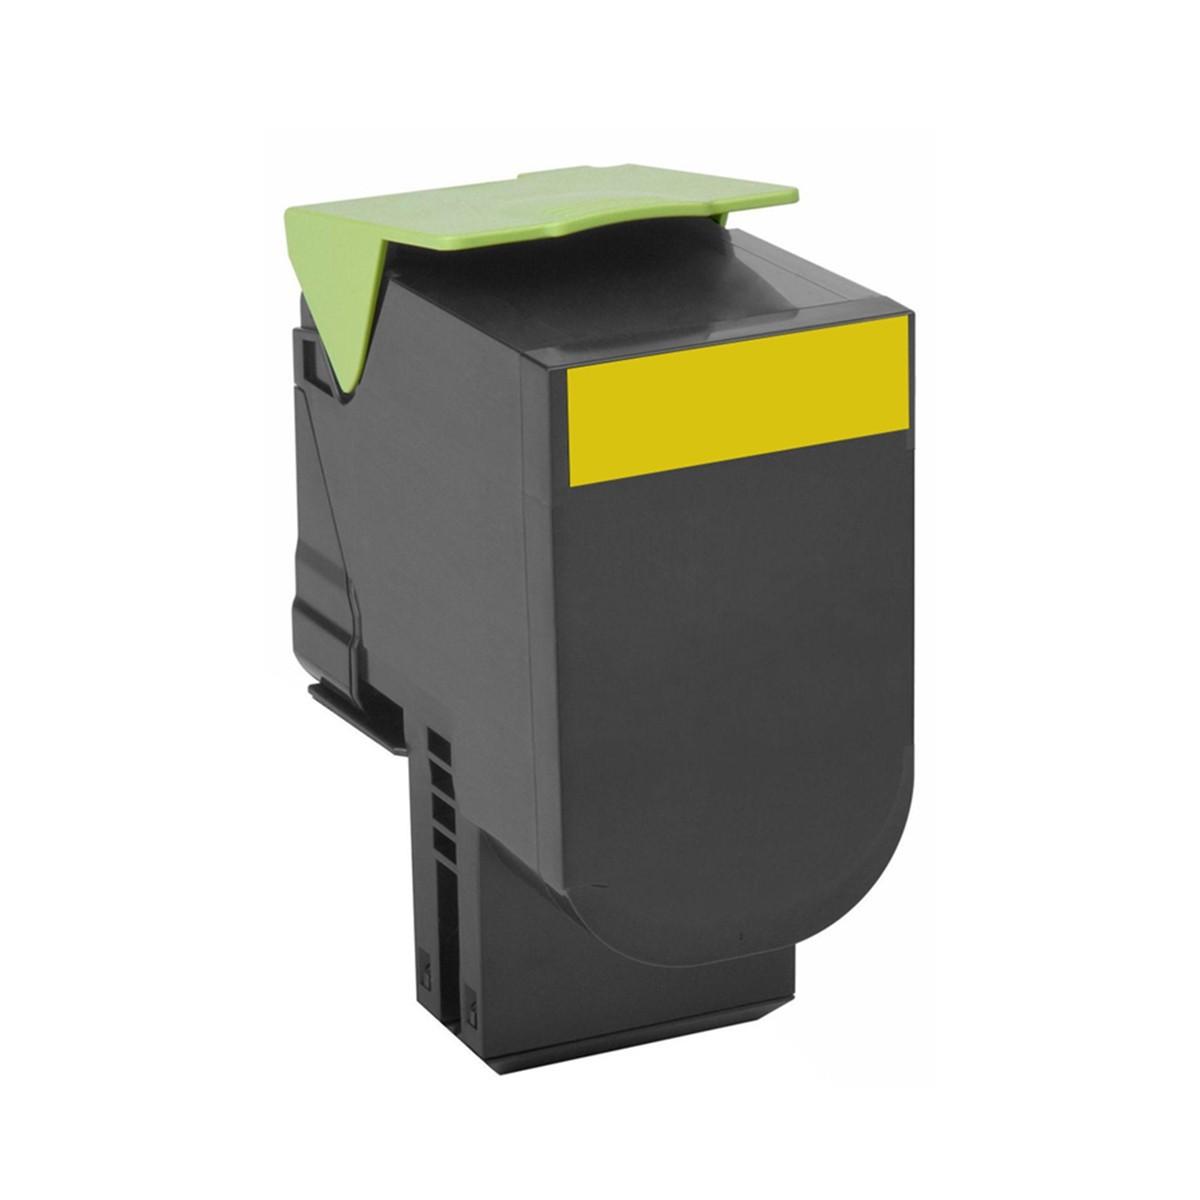 KIT 04 TONERS COMPATÍVEIS COM LEXMARK [80C8SK0] CX310 CX410 CX510 4k e 3k B/M/C/Y - Cartucho & Cia